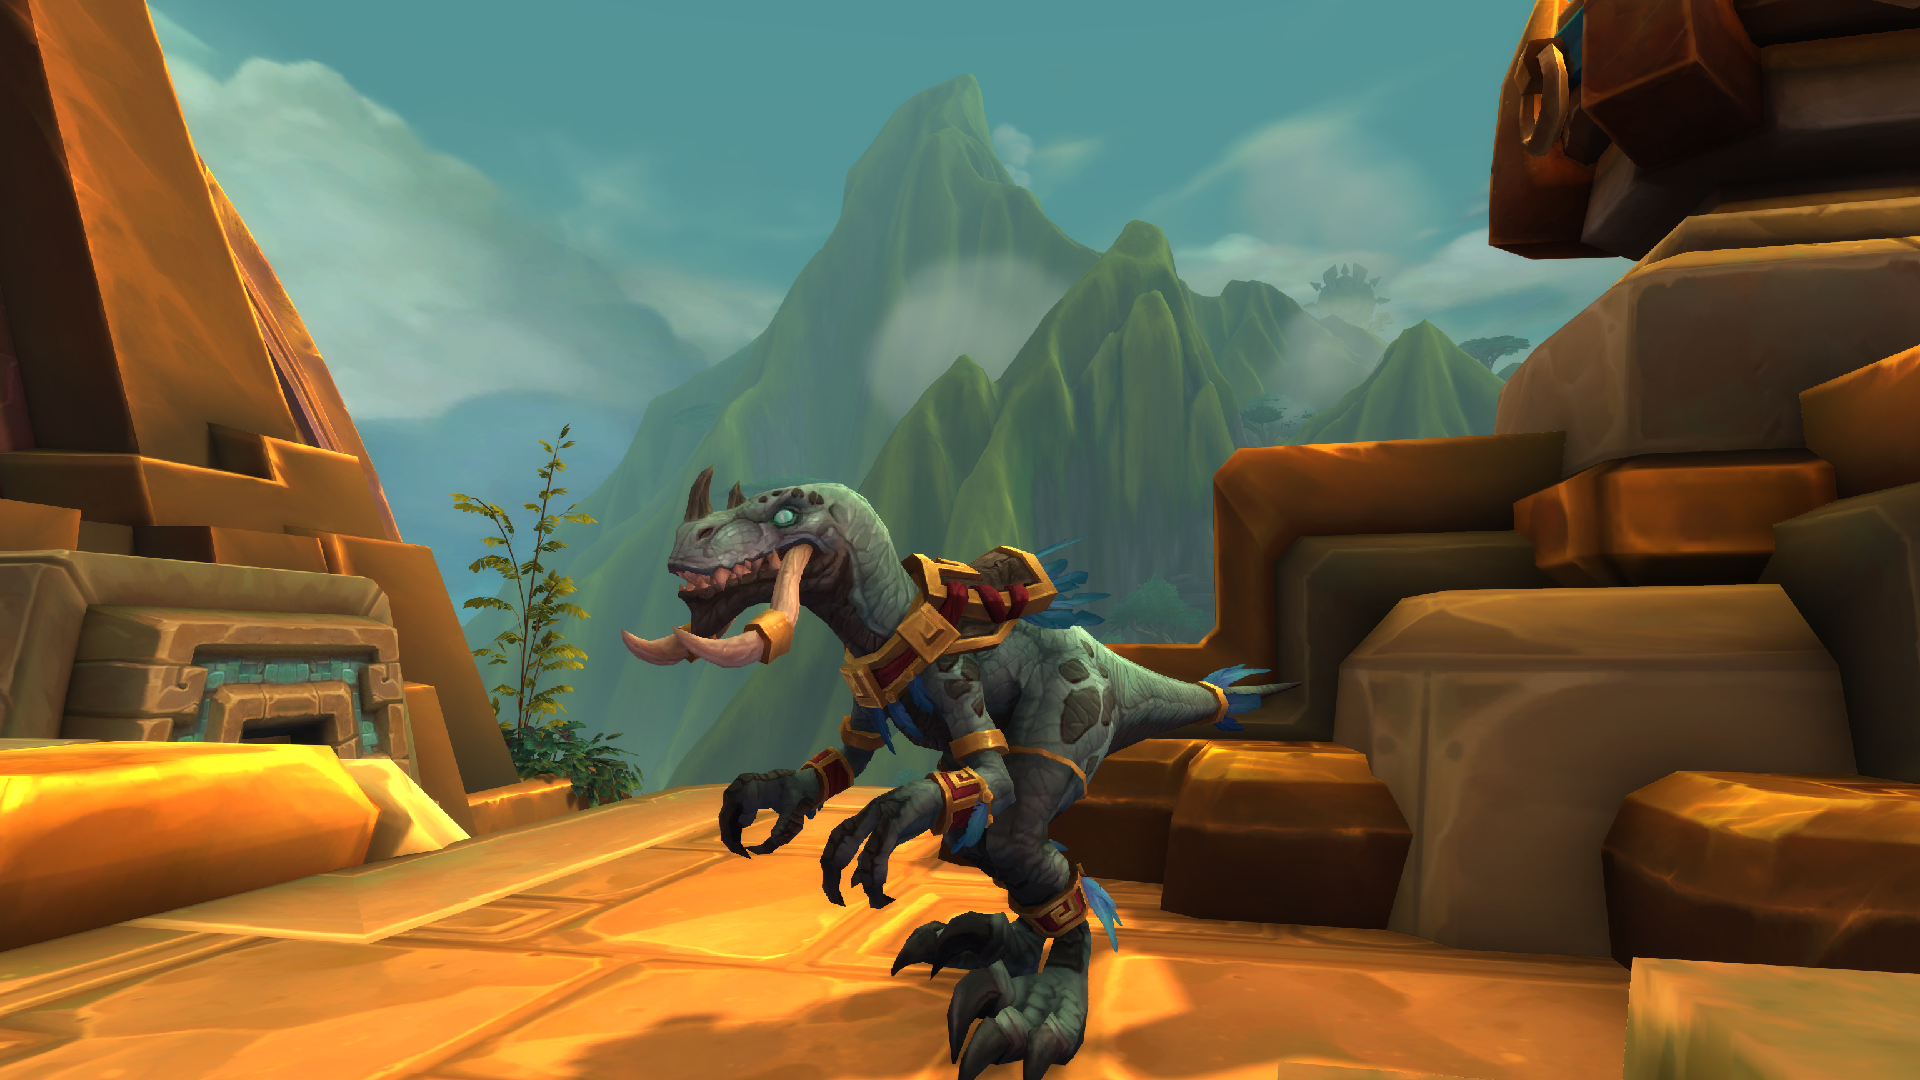 World Of Warcraft Screenshot 2019.05.27 - 12.26.23.69.png